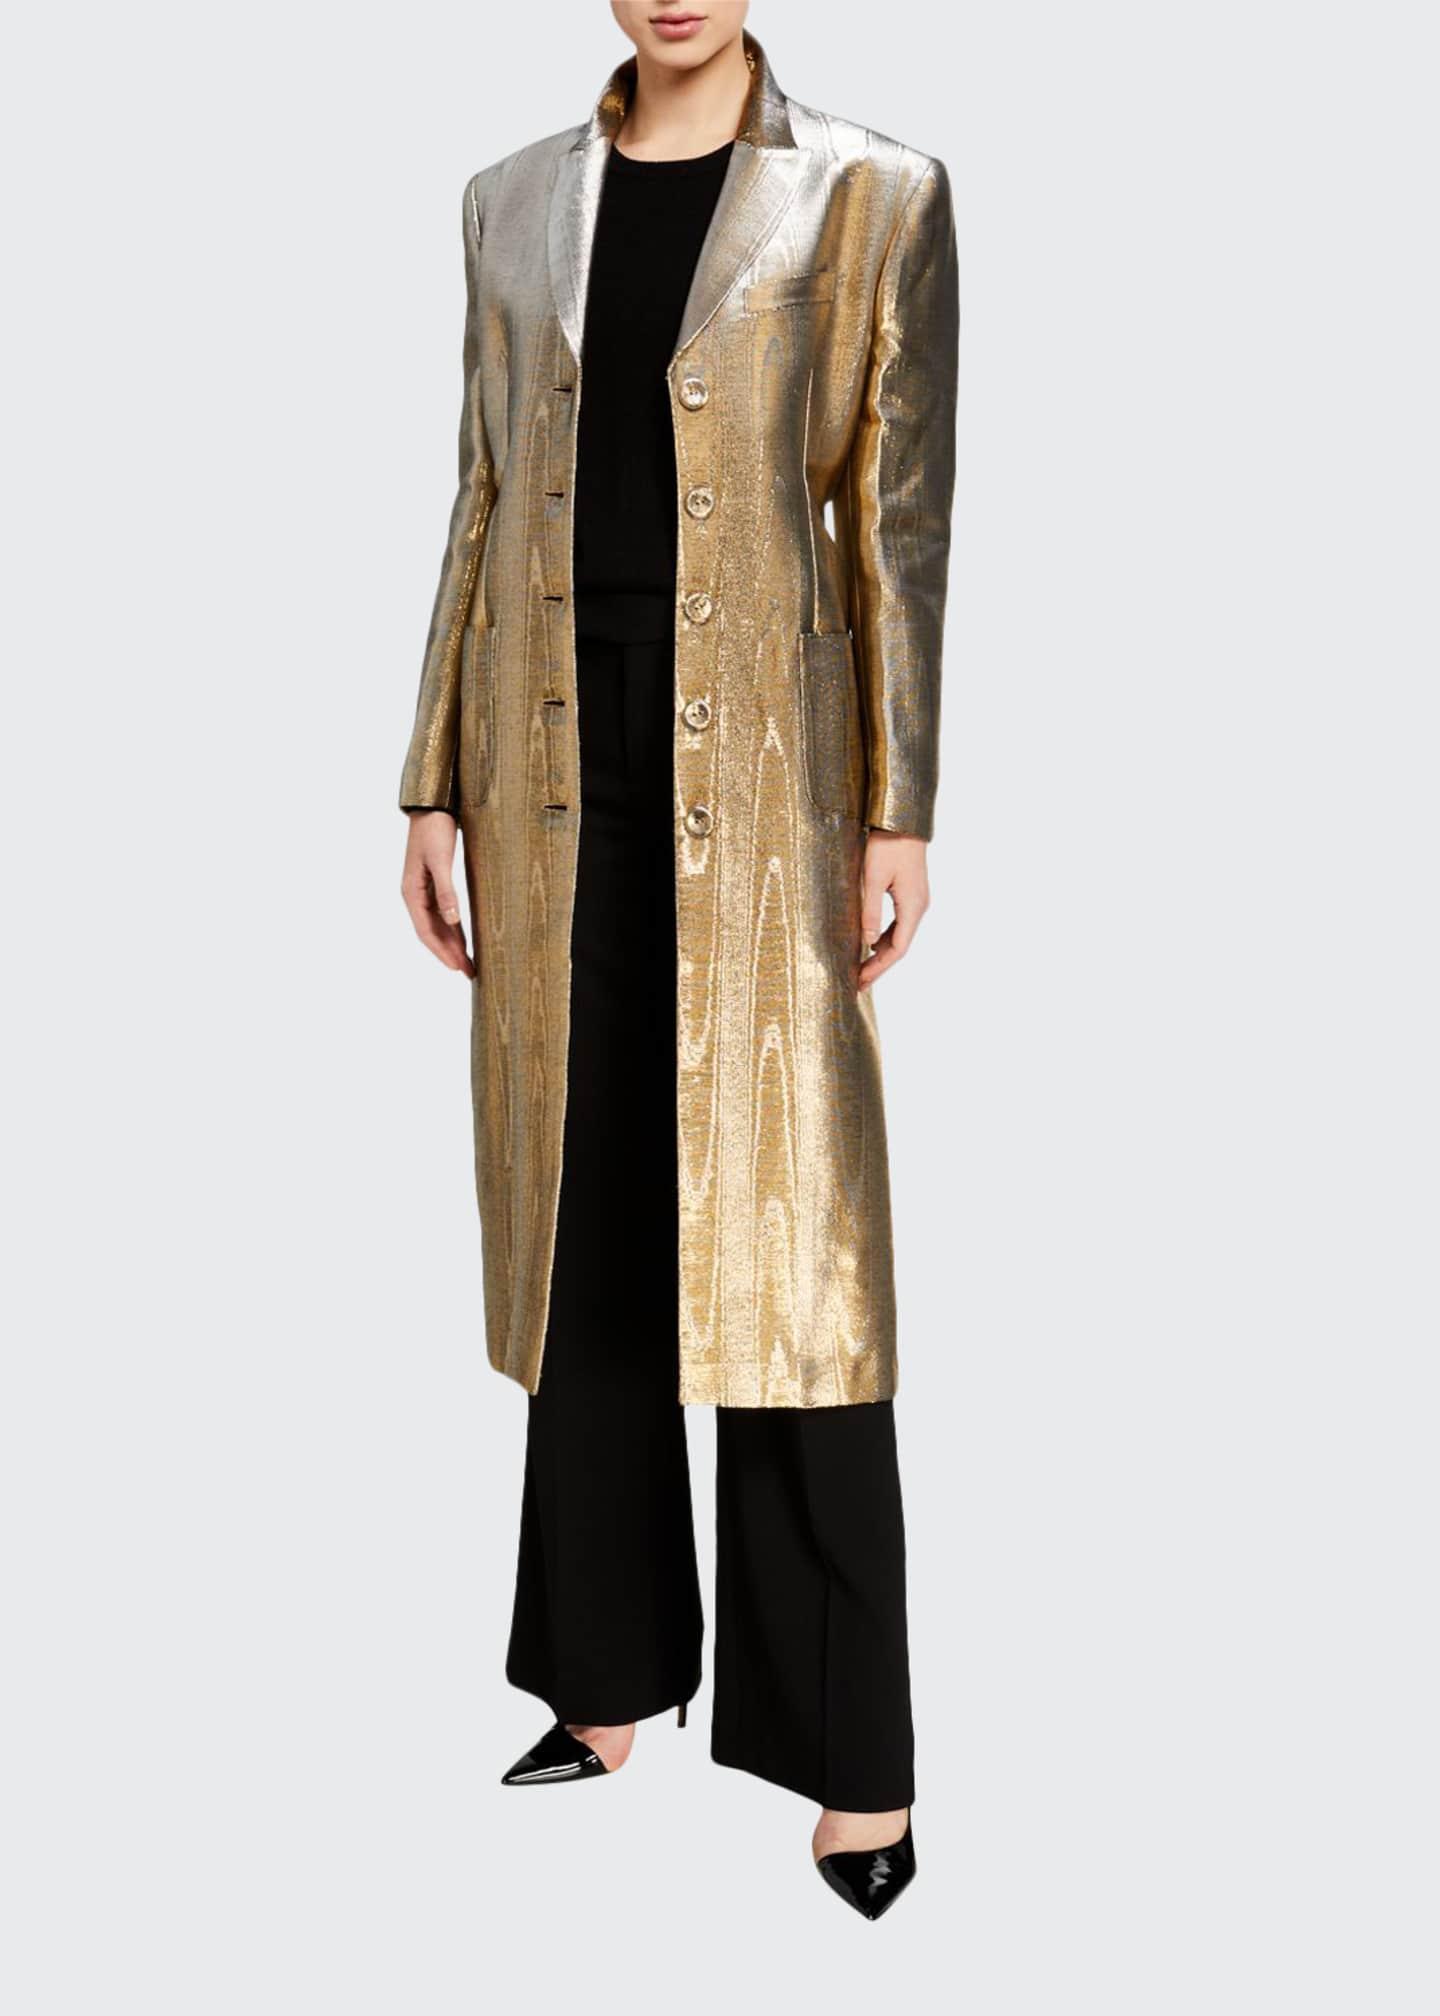 Racil Paloma Metallic Tuxedo-Lapel Coat